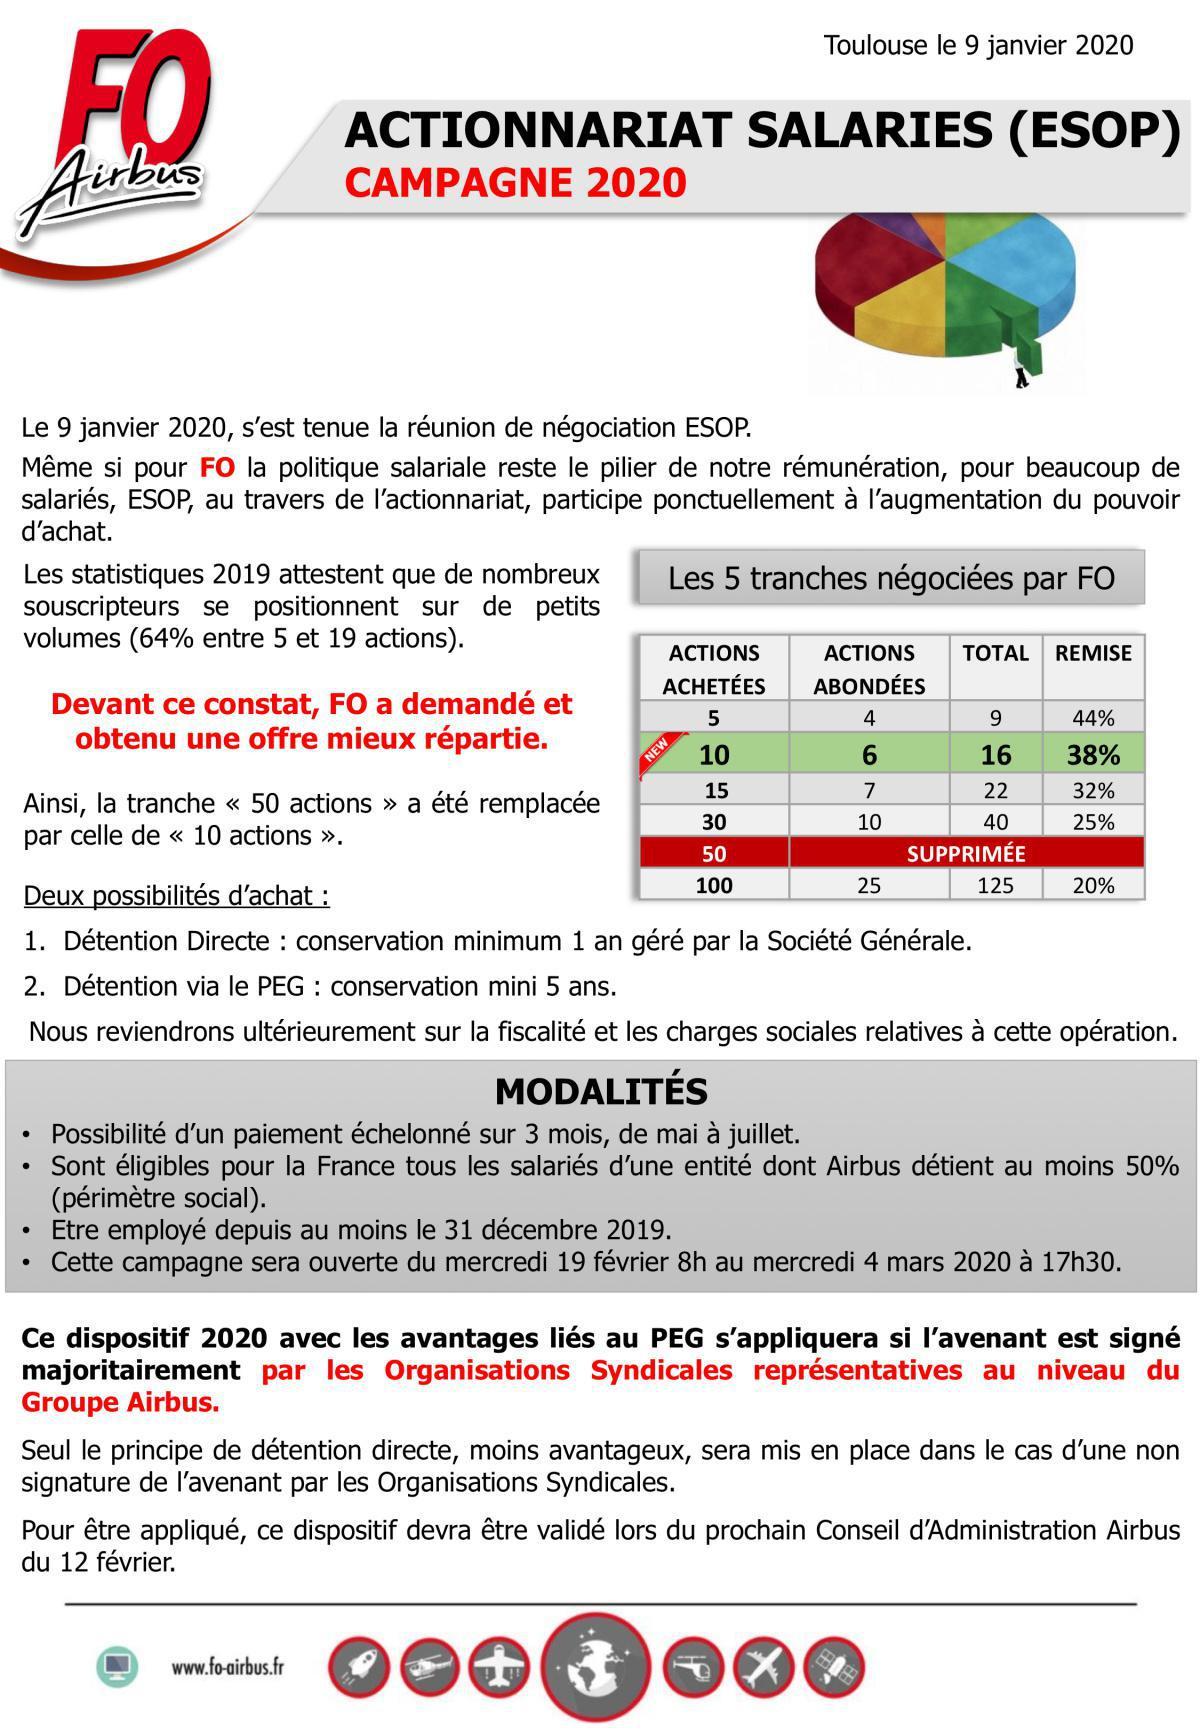 ACTIONNARIAT SALARIES (ESOP) 2020 - la tranche FO